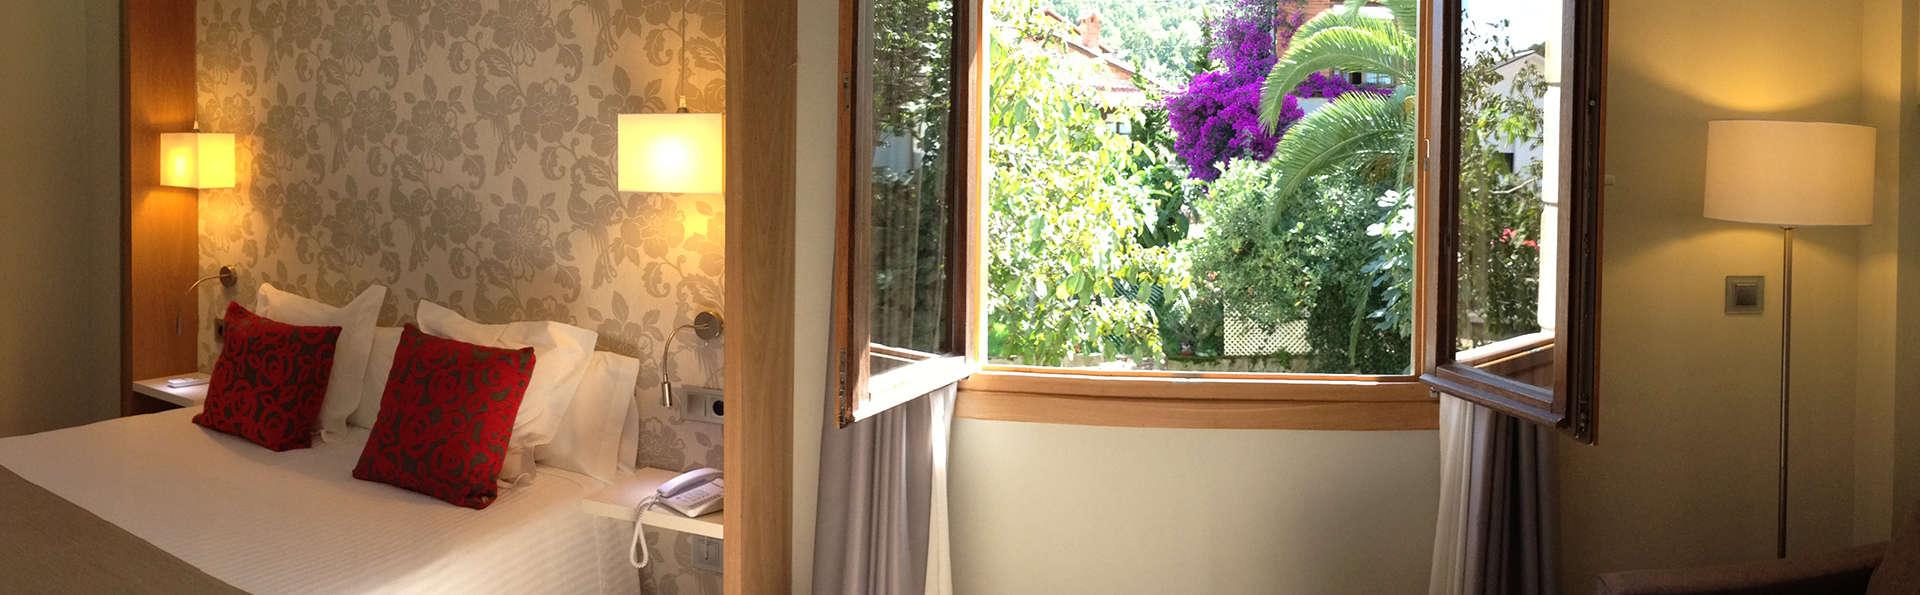 Hotel Tinas de Pechón - EDIT_room5.jpg